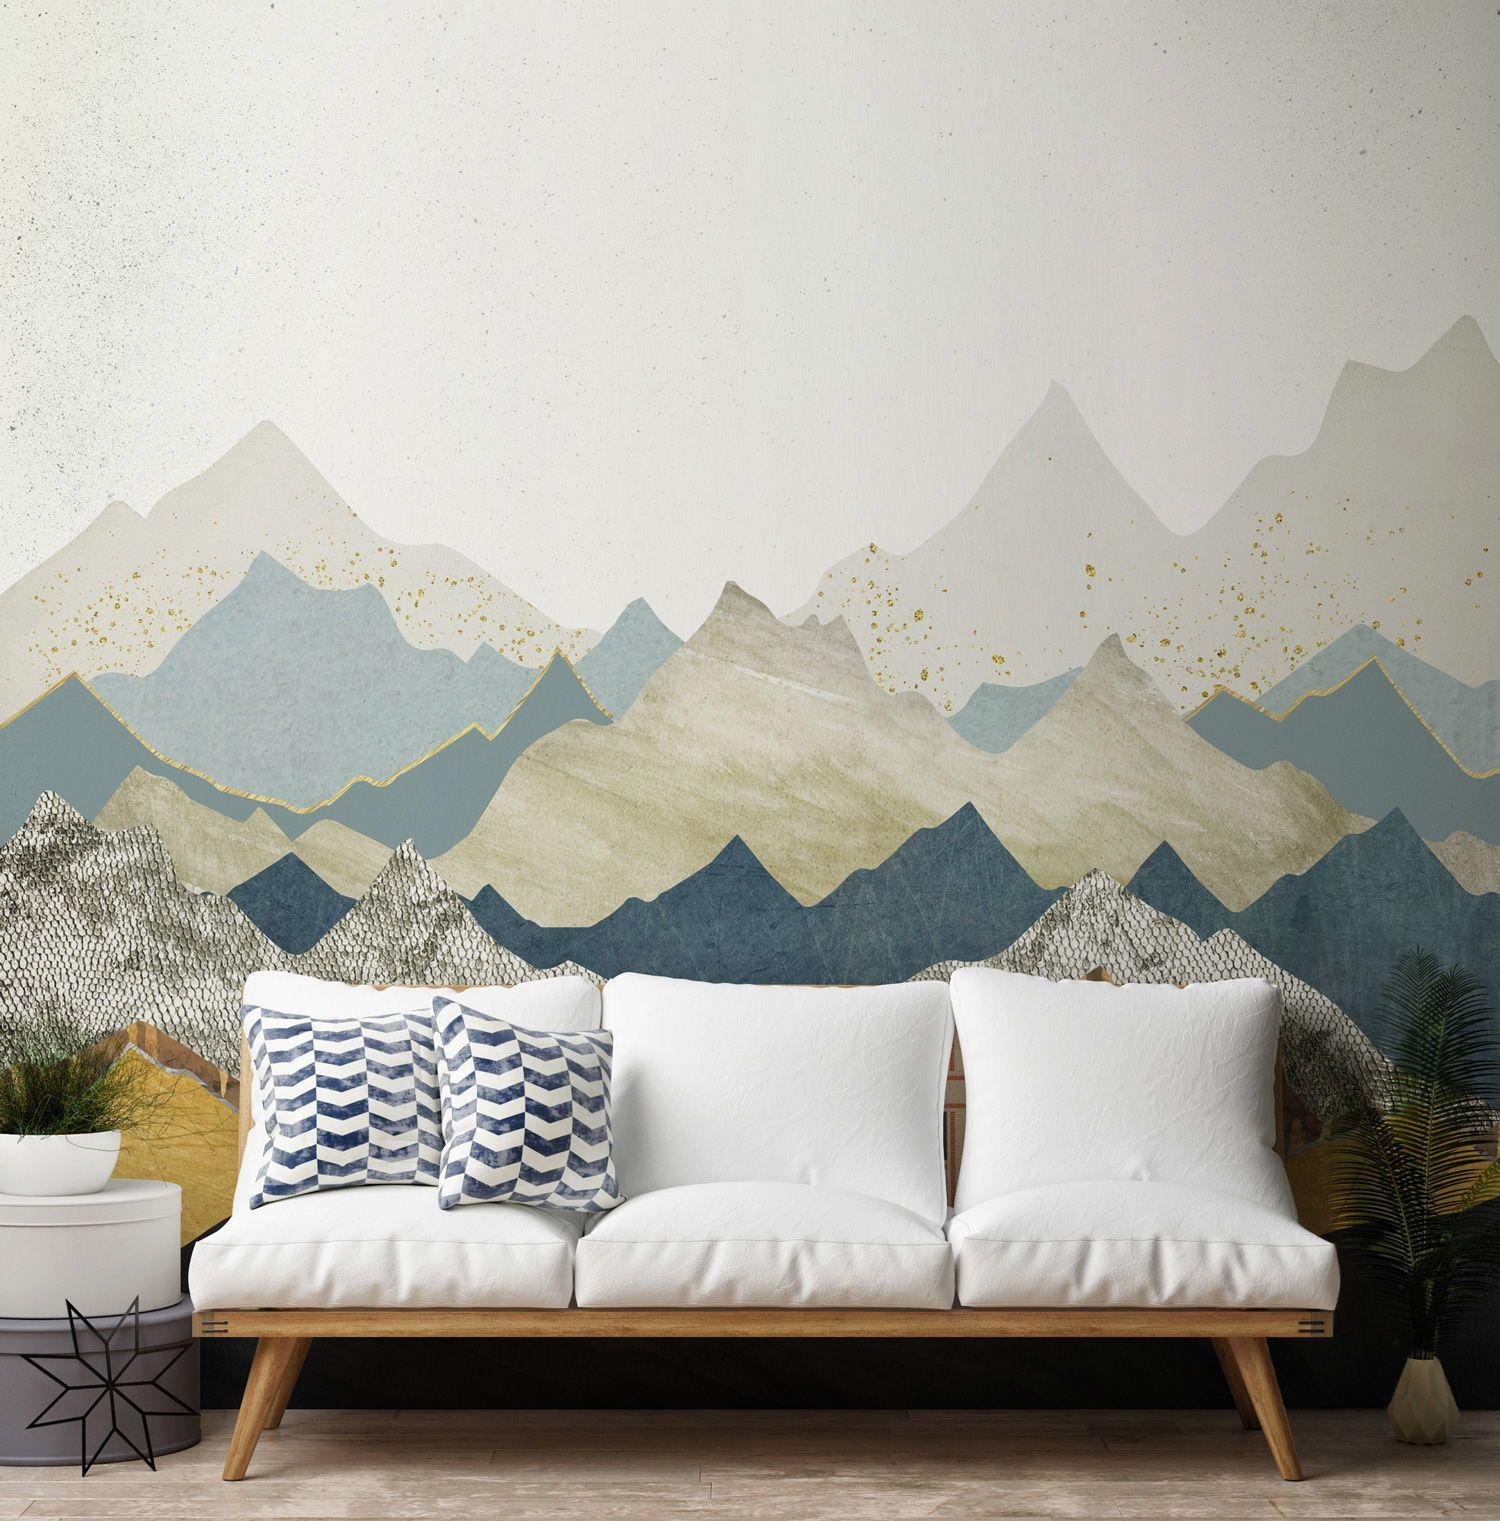 Distant Peaks Wallpaper Wallsauce Nz Wallpaper Living Room World Of Interiors View Wallpaper